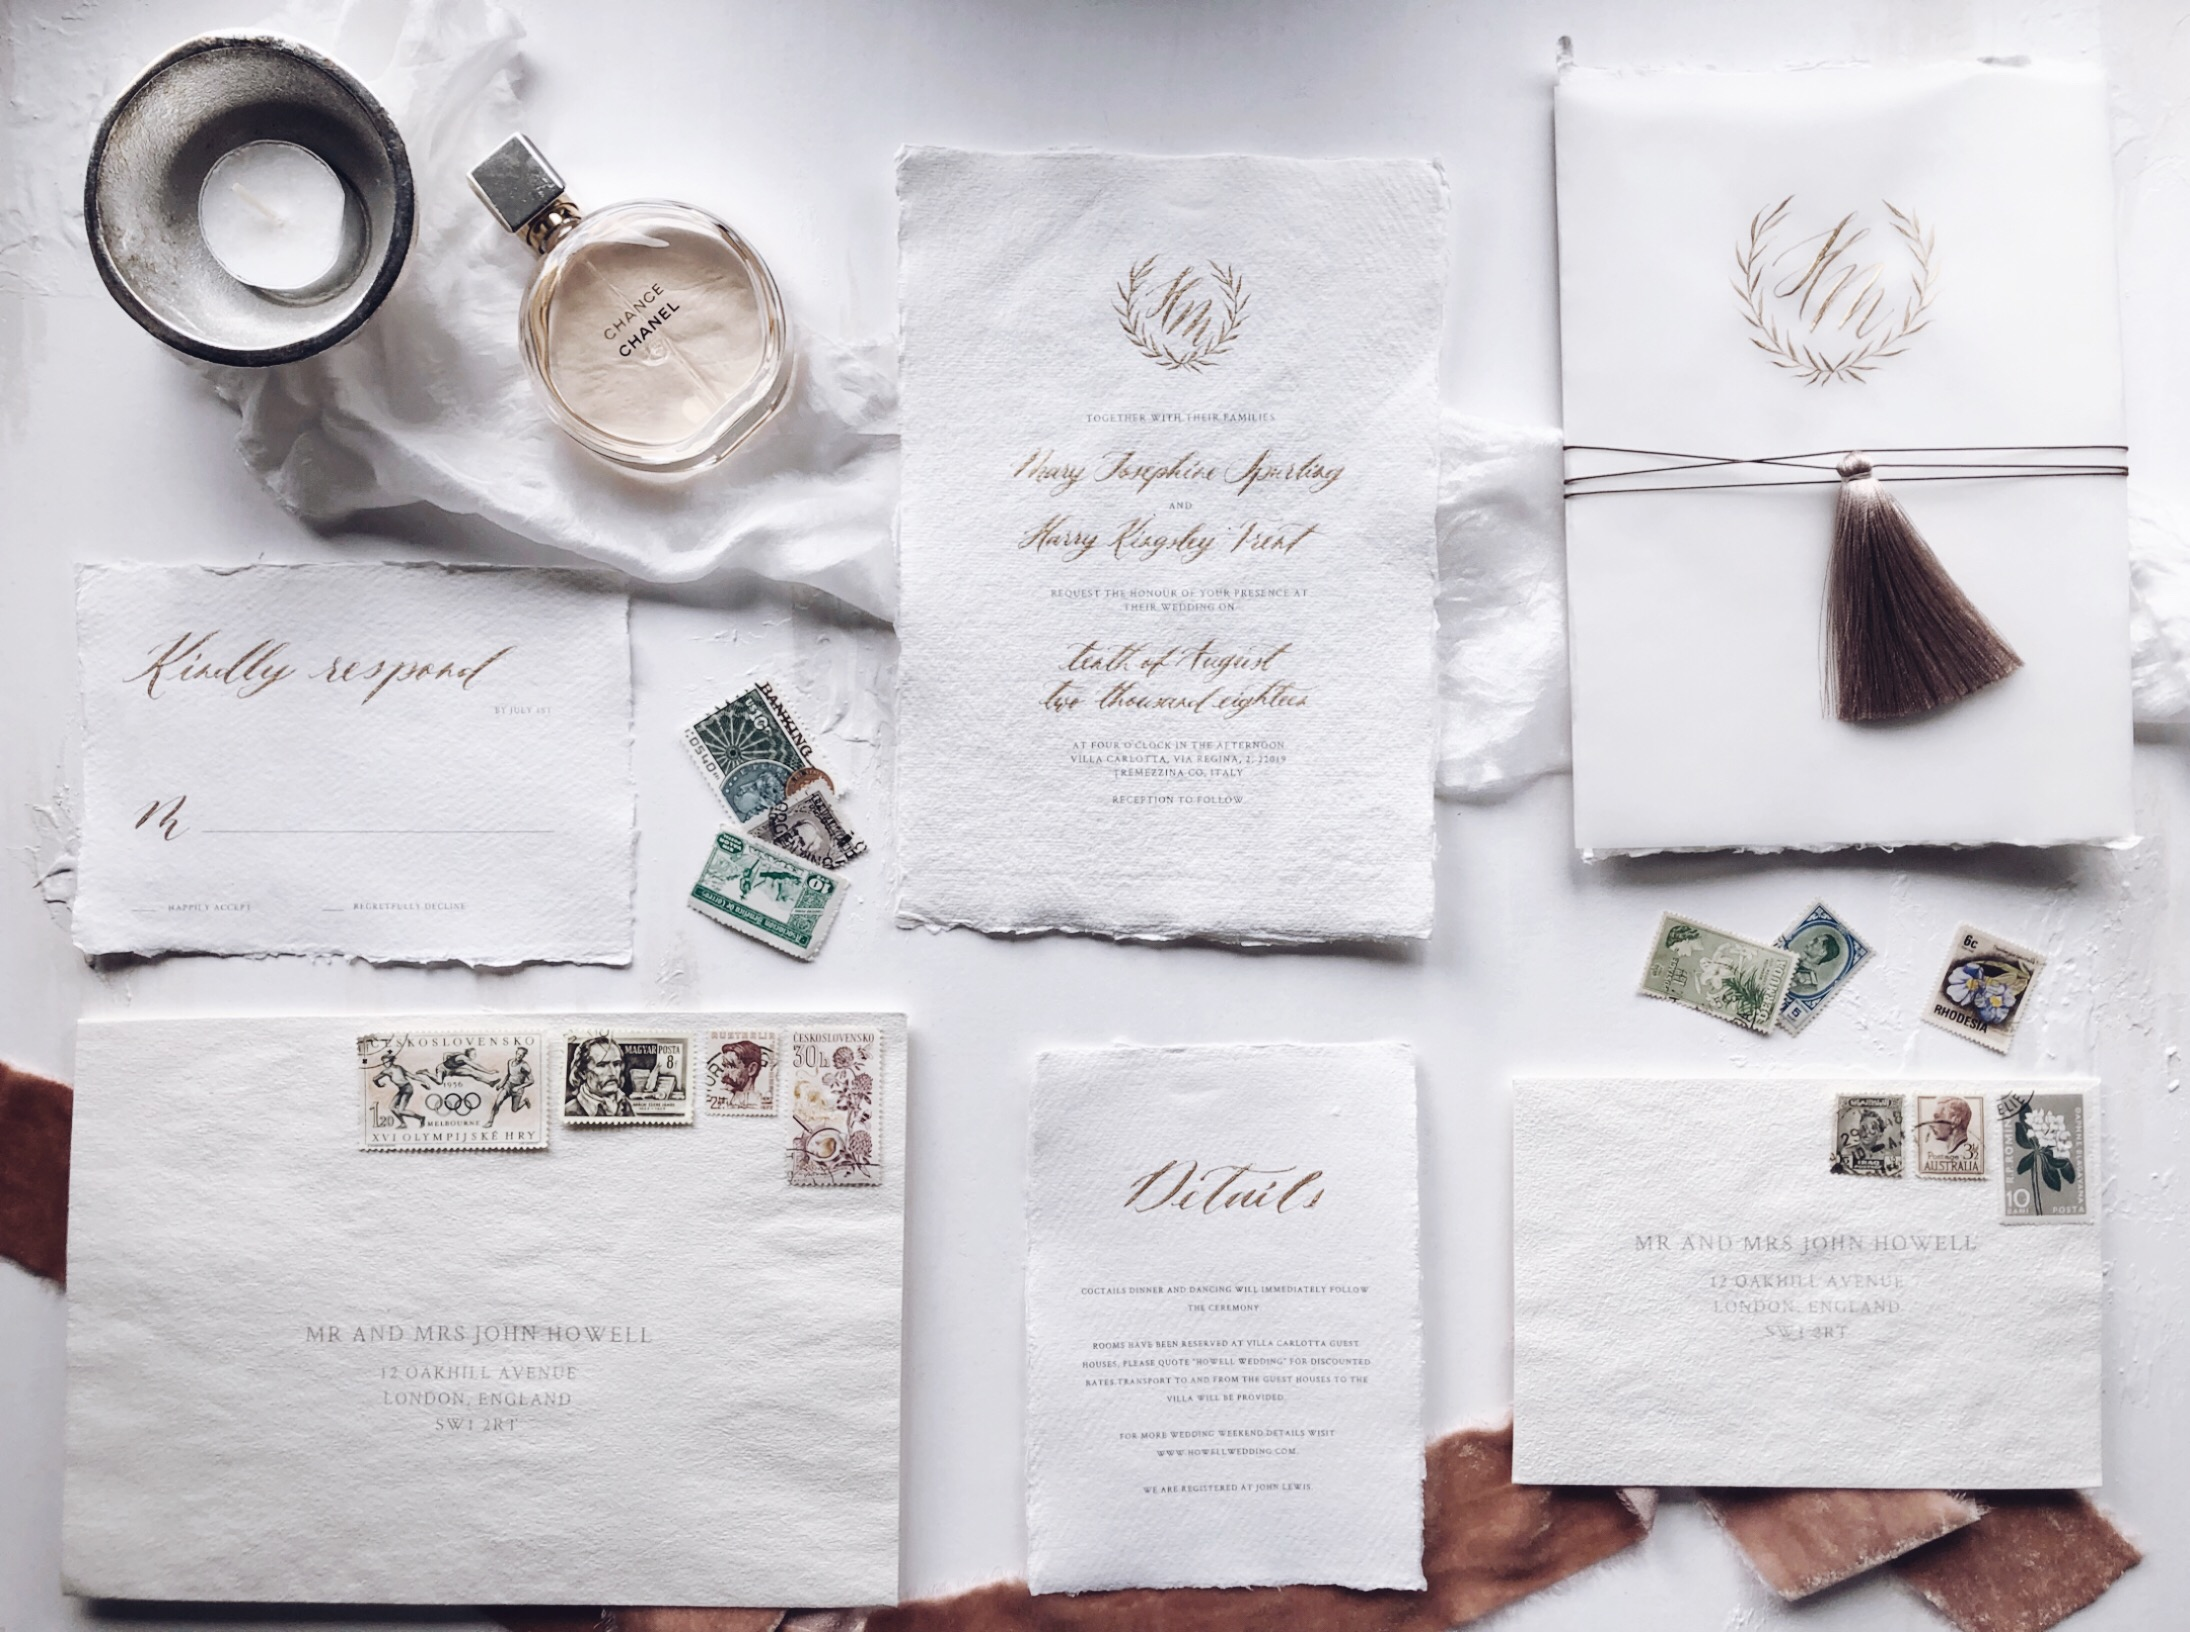 calligraphy_wedding_invitations_handmade_paper.JPG